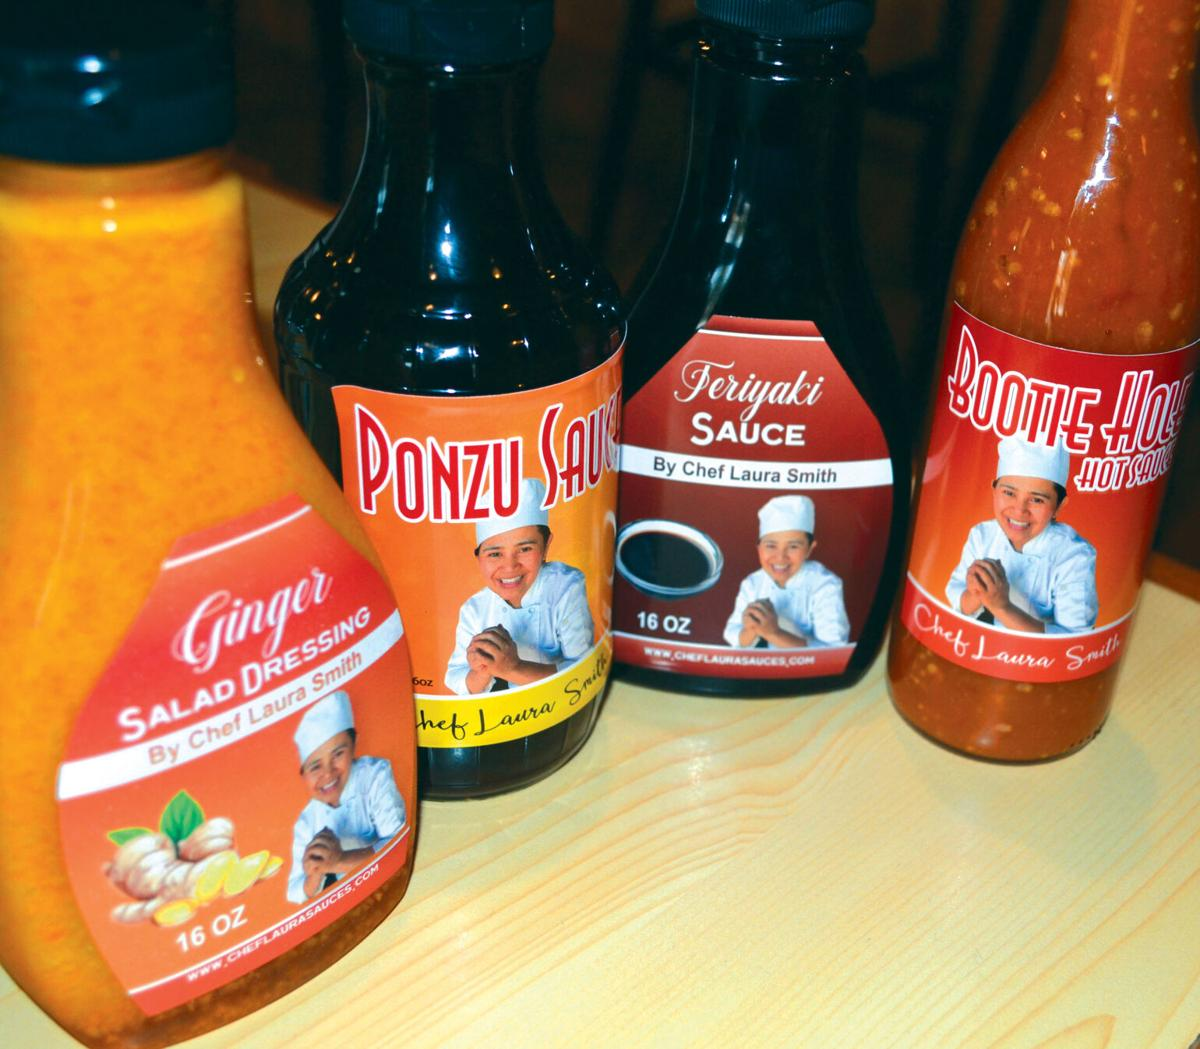 Chef Laura's sauces